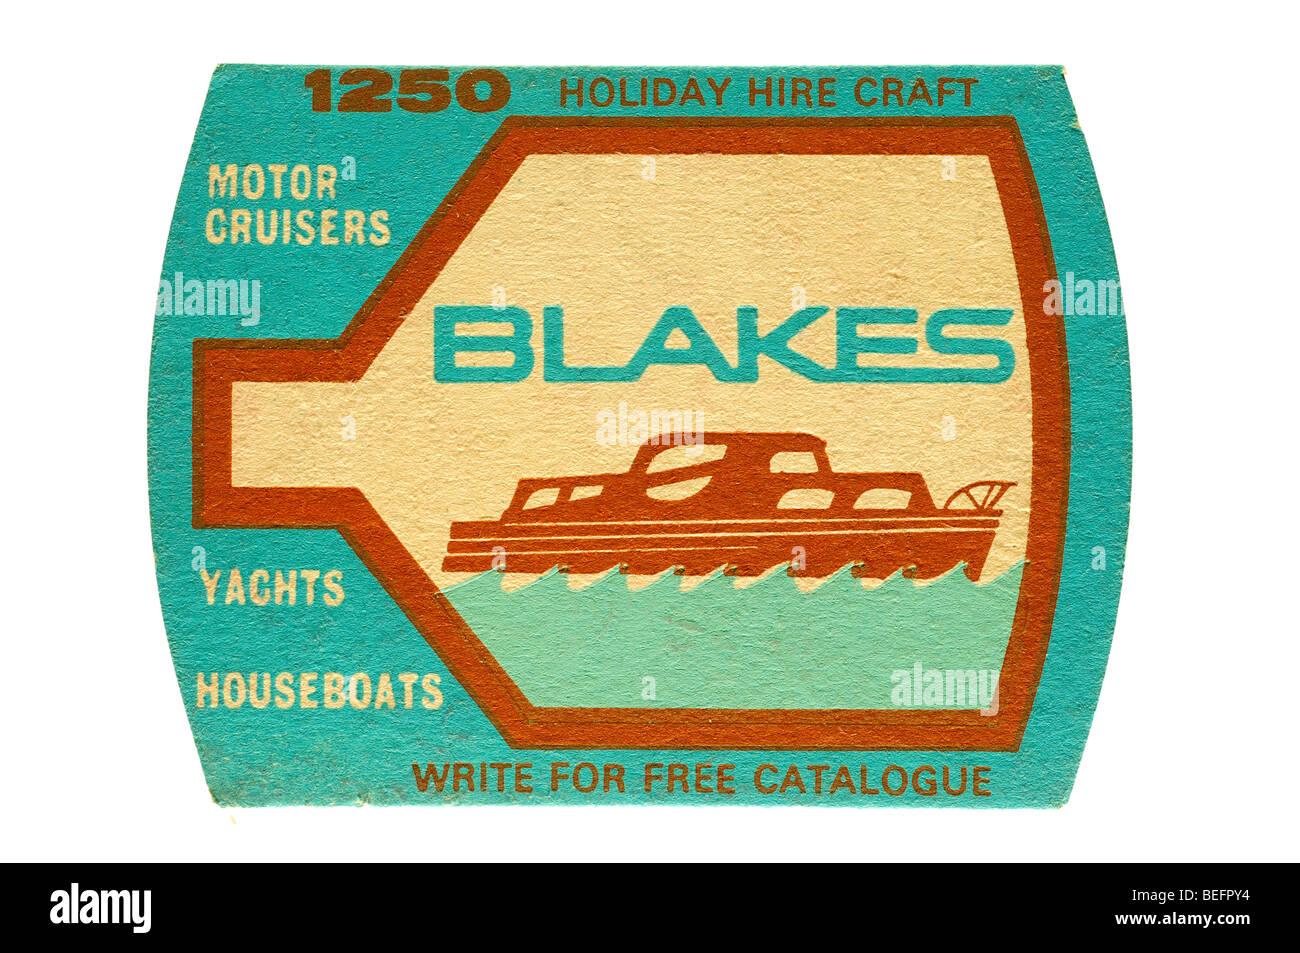 1250 holiday hire craft motor cruisers yachts houseboats blakes - Stock Image